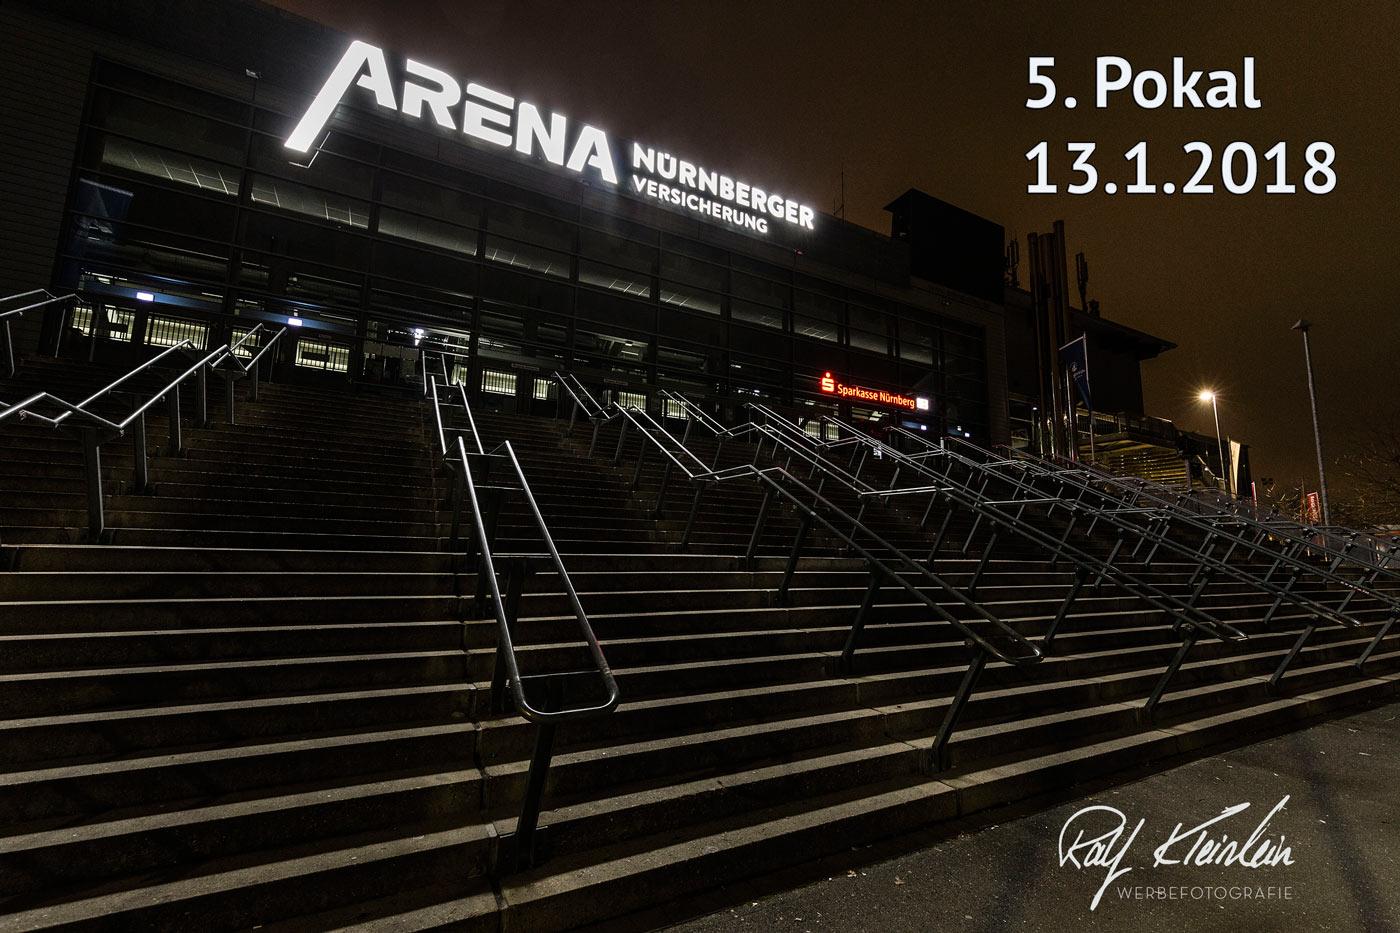 5. Pokal der Arena Nürnberger Versicherung am 13.01.2018